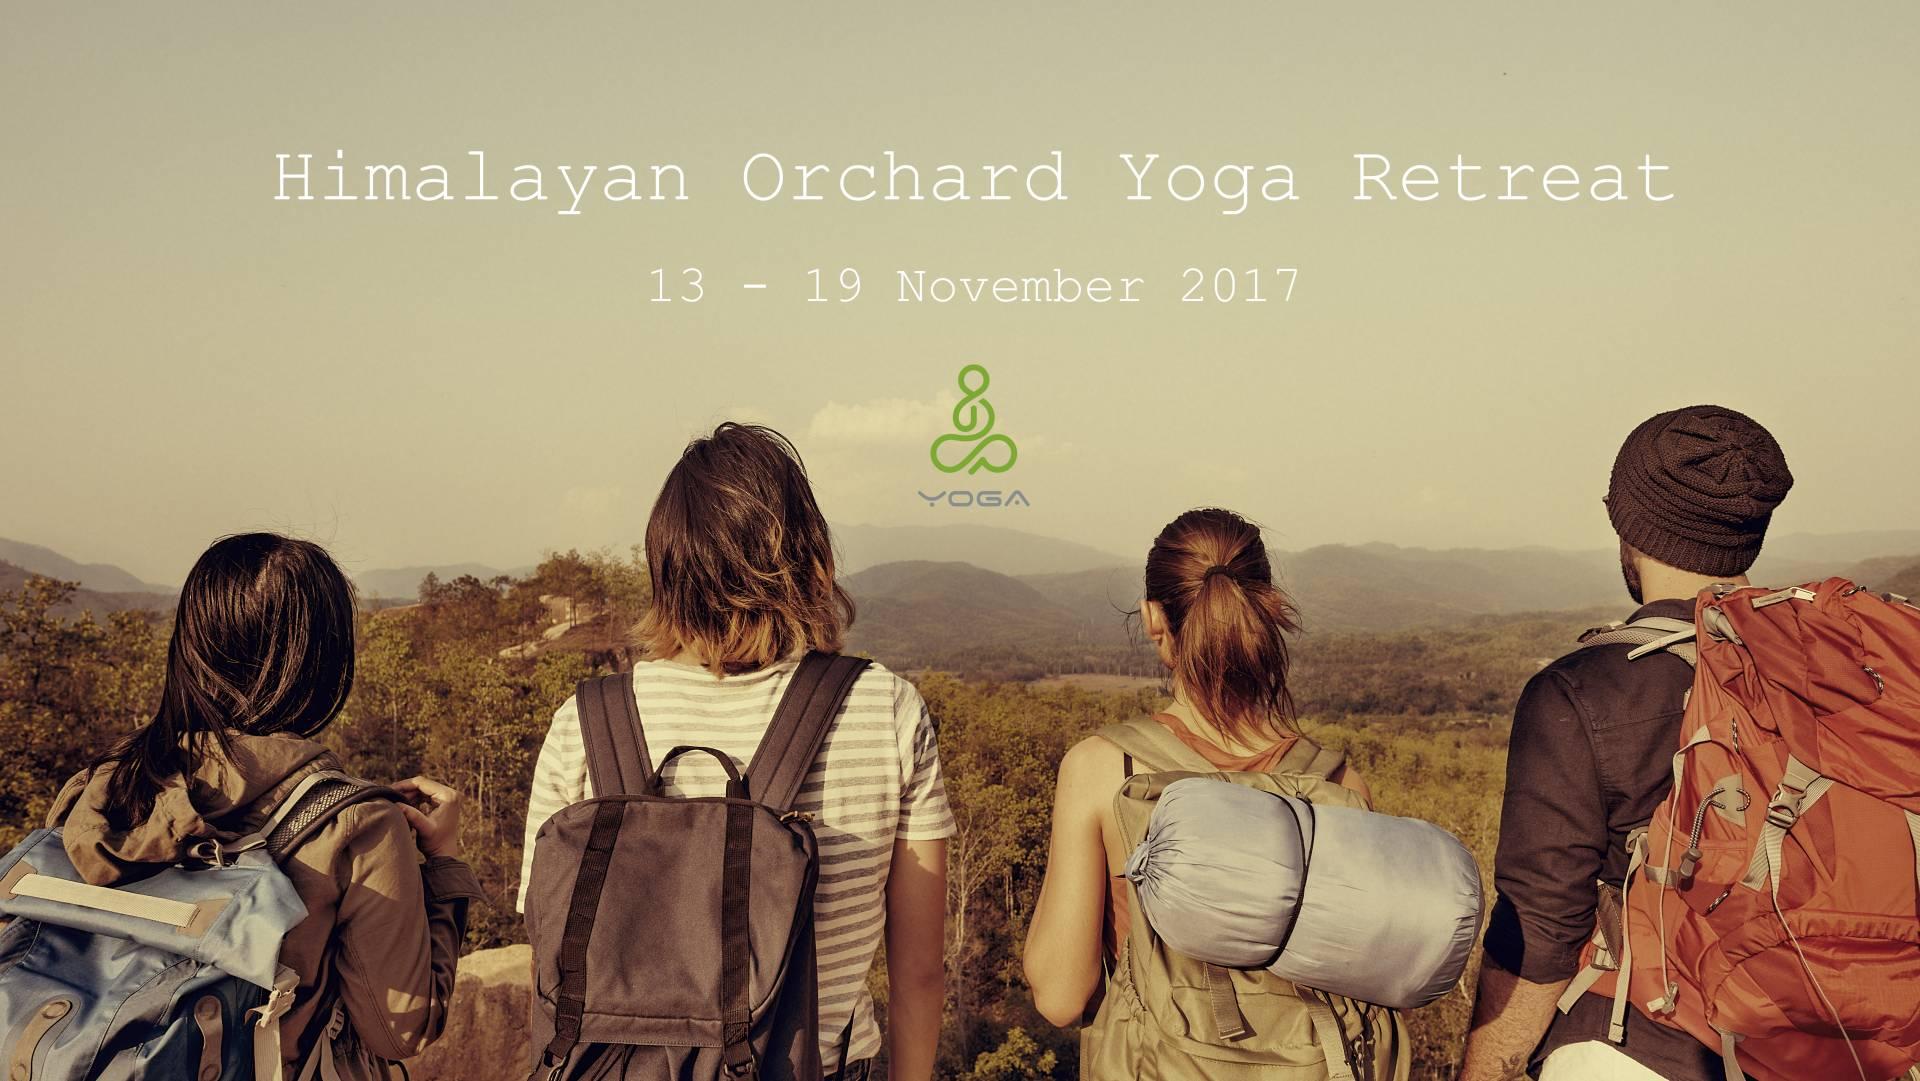 Himalayan Orchard Yoga Retreat